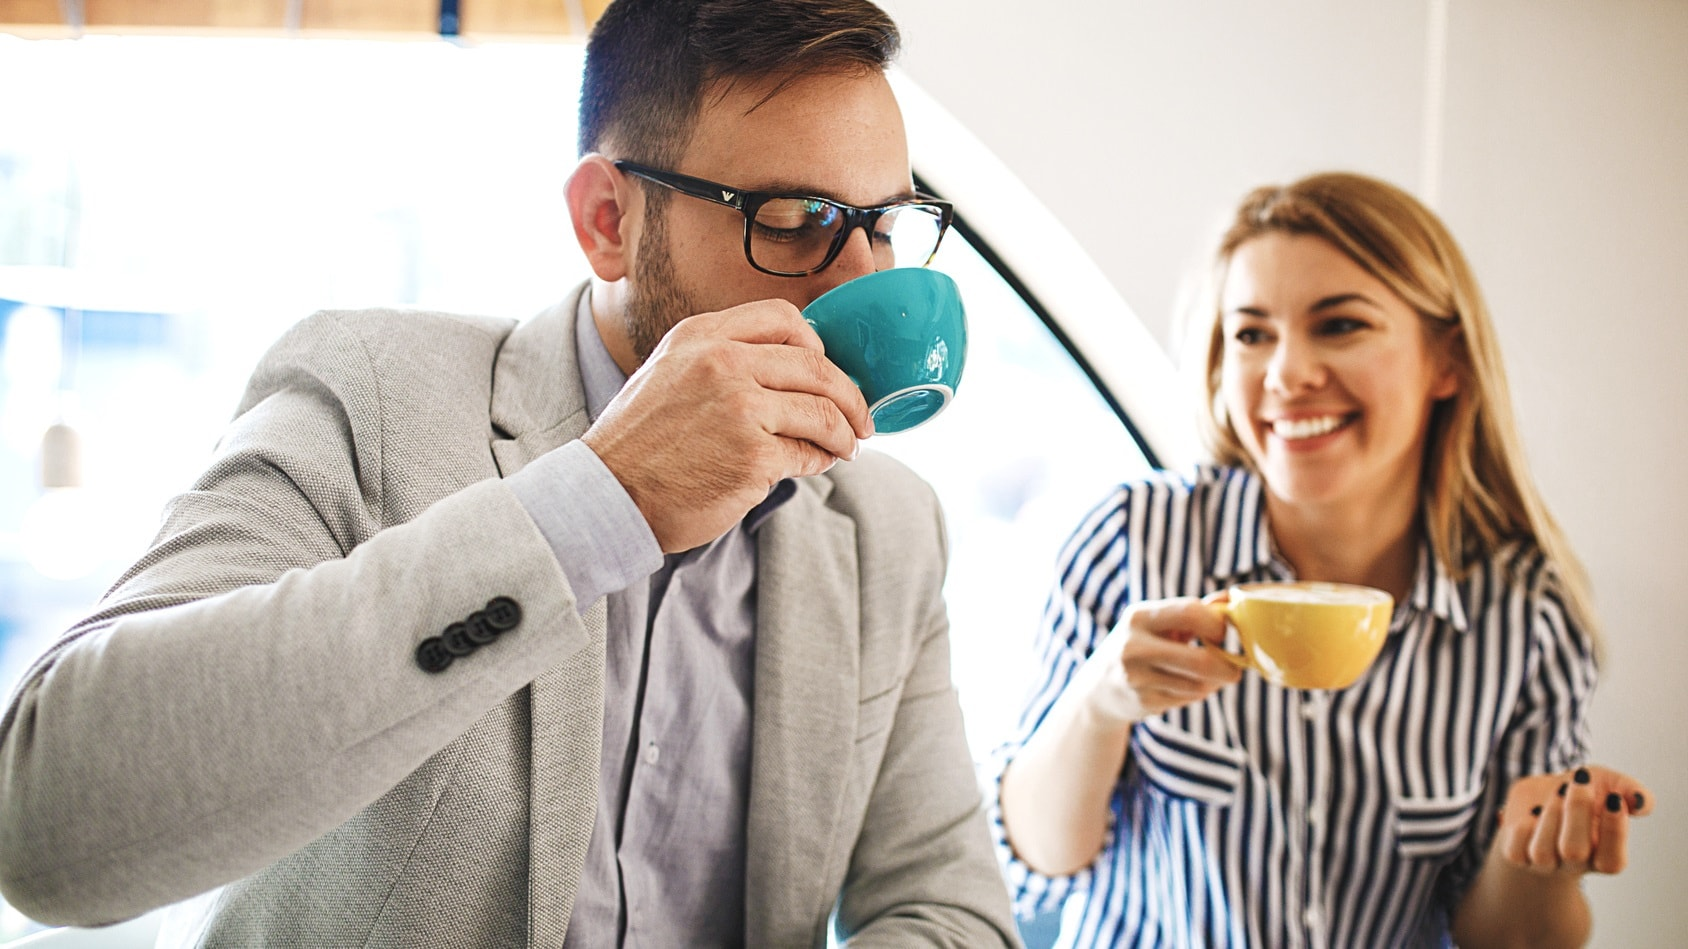 Kup kawę nieznajomemu